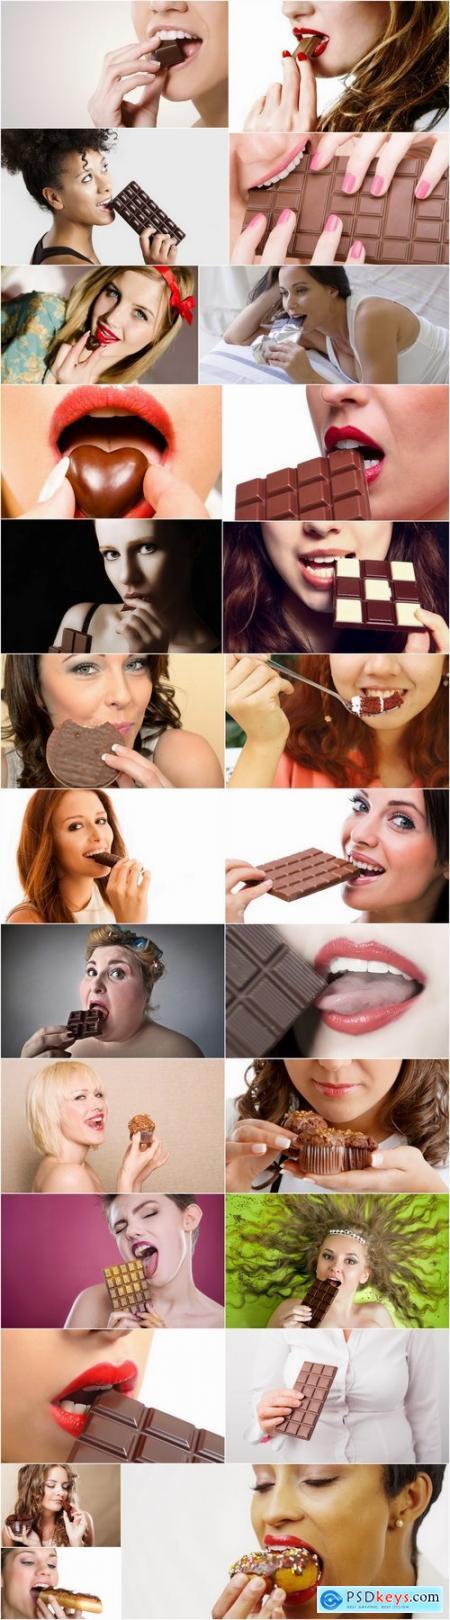 Woman eating chocolate sweetness 25 HQ Jpeg